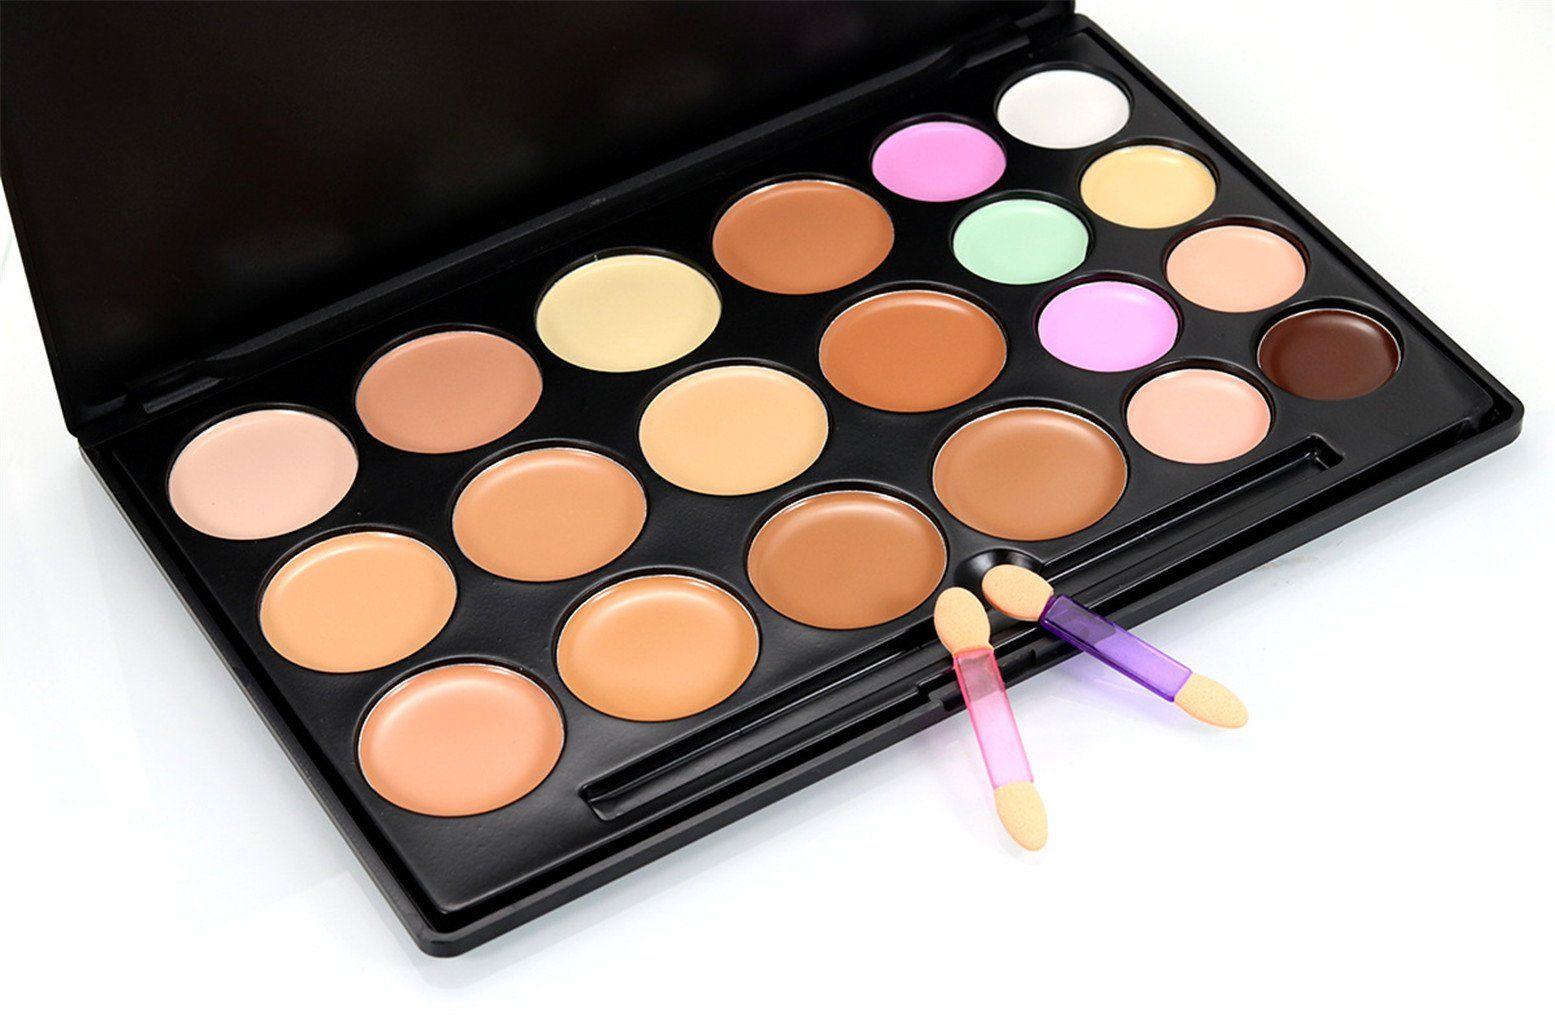 FantasyDay Pro 20 Colors Cream Concealer Camouflage Makeup